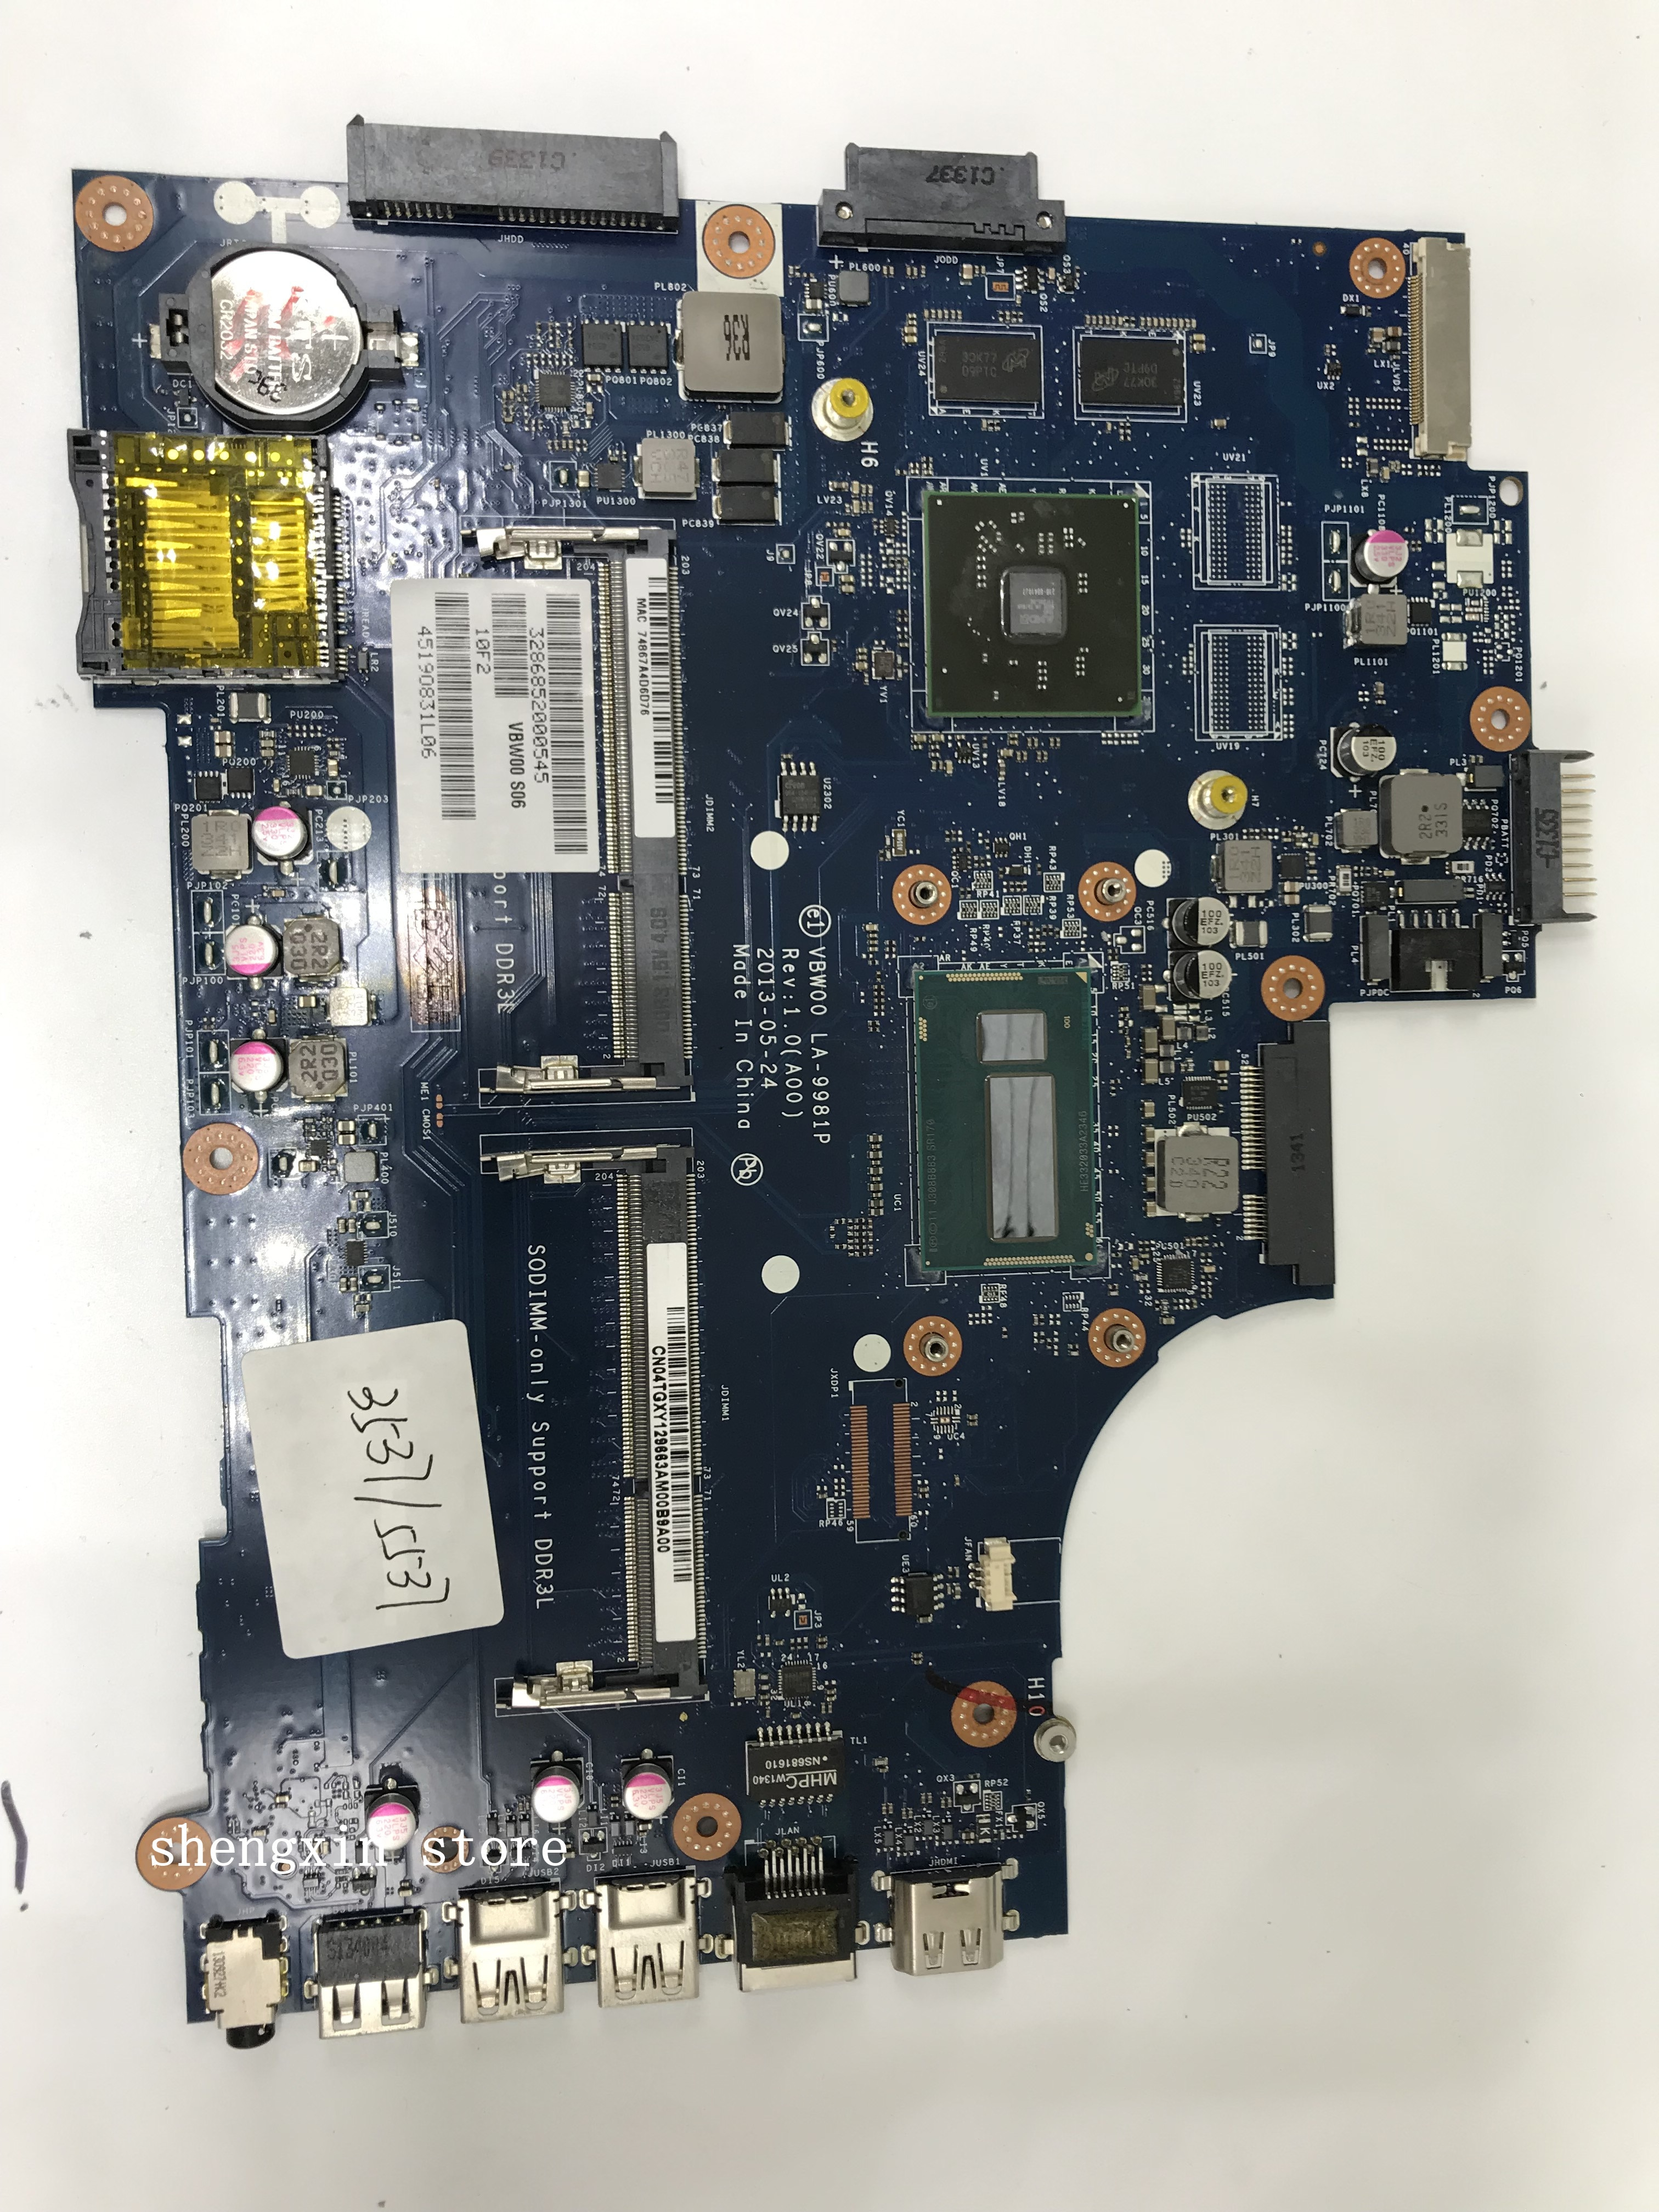 CN-04TGXY 4 VBW00 LA-9981P TGXY PARA DELL Inspiron 5537 3537 laptop motherboard REV 1.0 (A00) I5-4200U mainboard